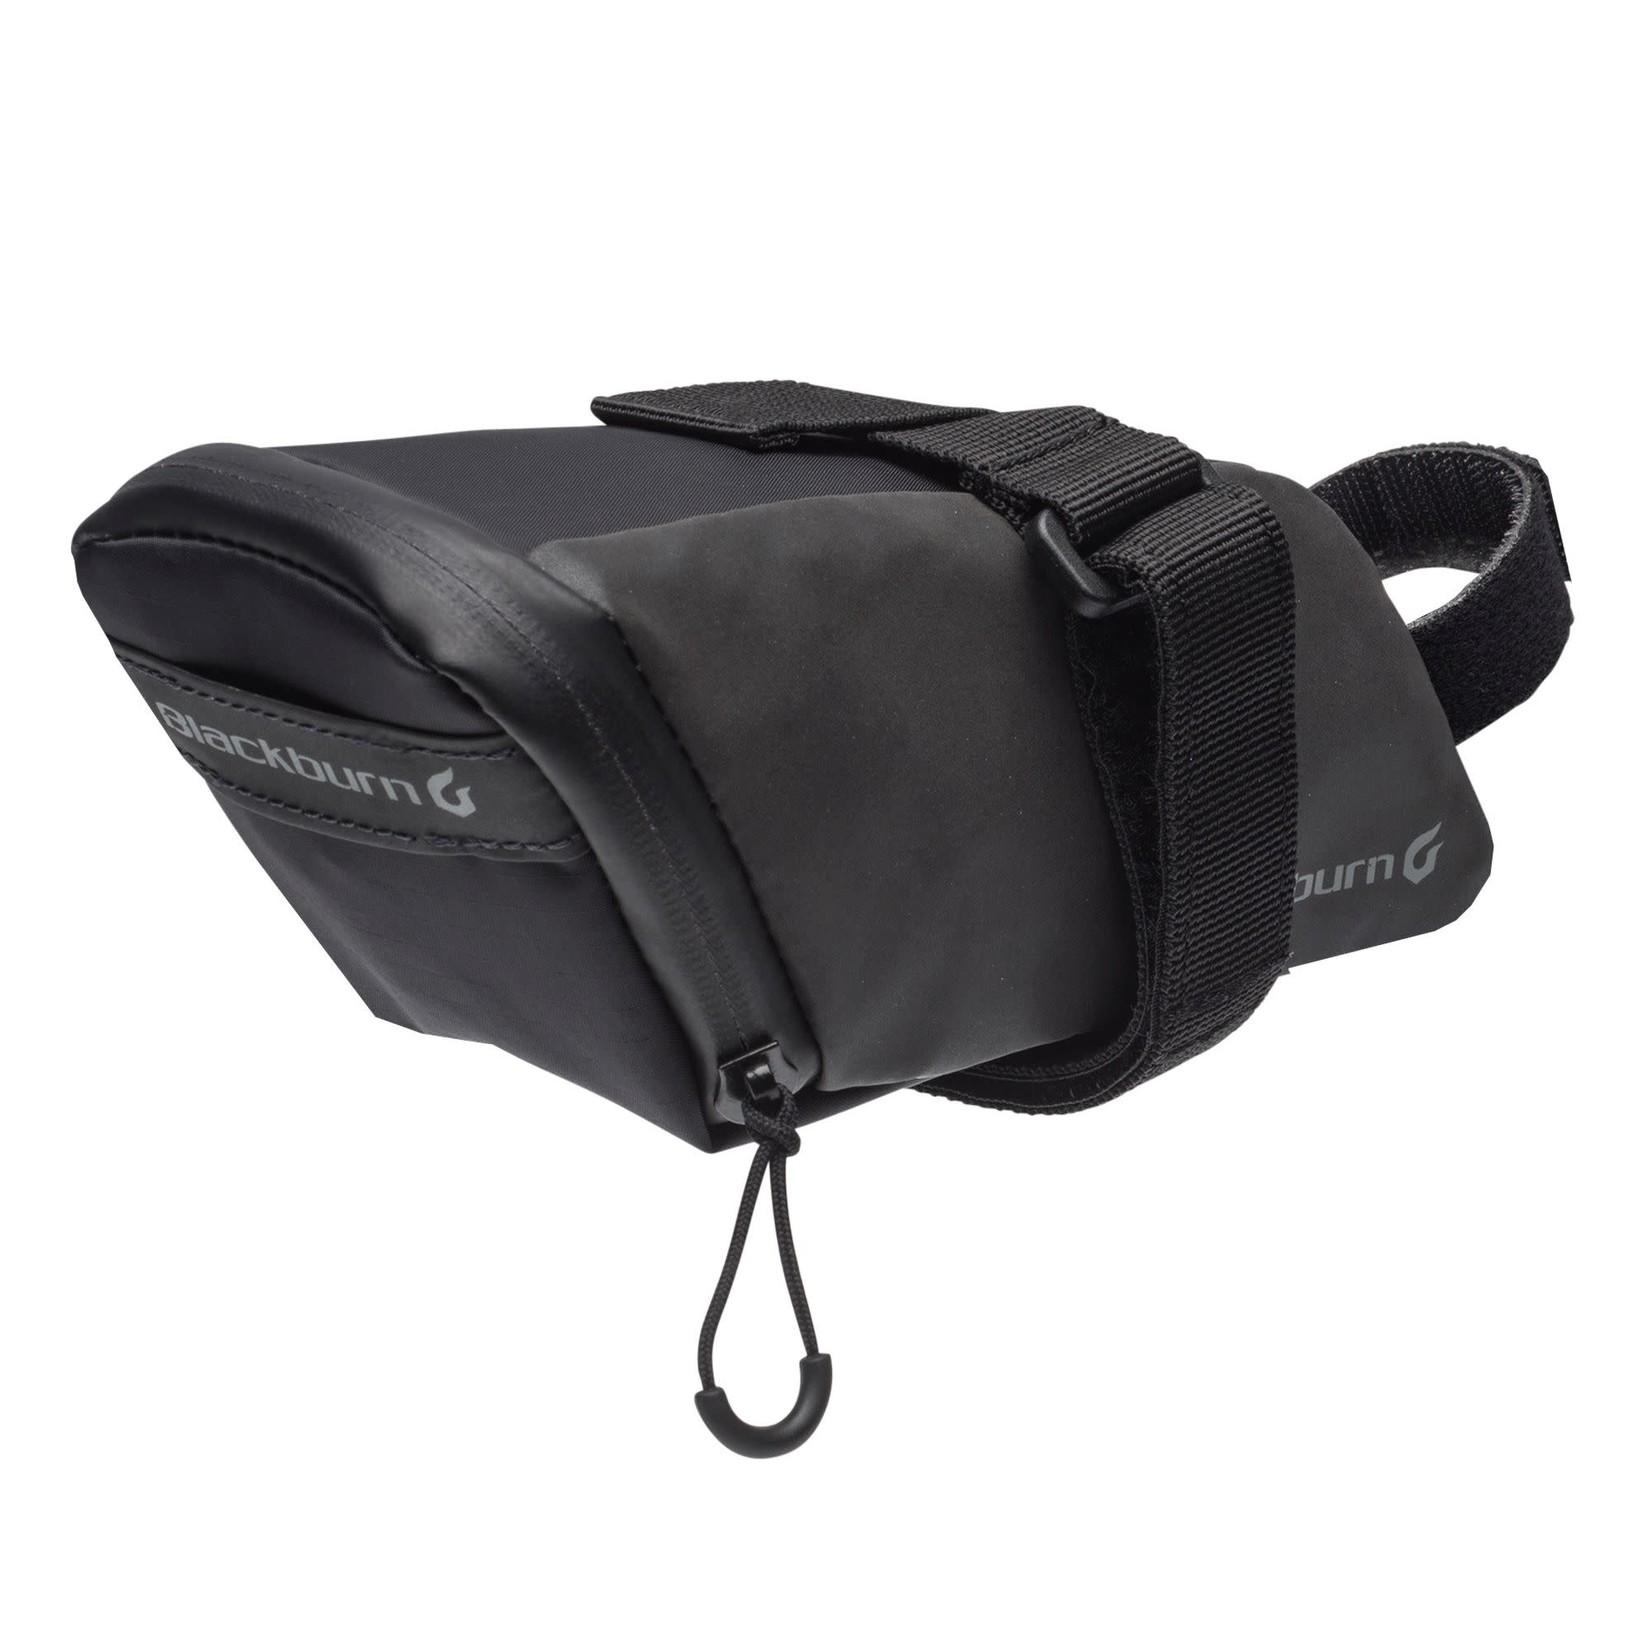 Blackburn Blackburn Grid Medium Seat Bag - Black